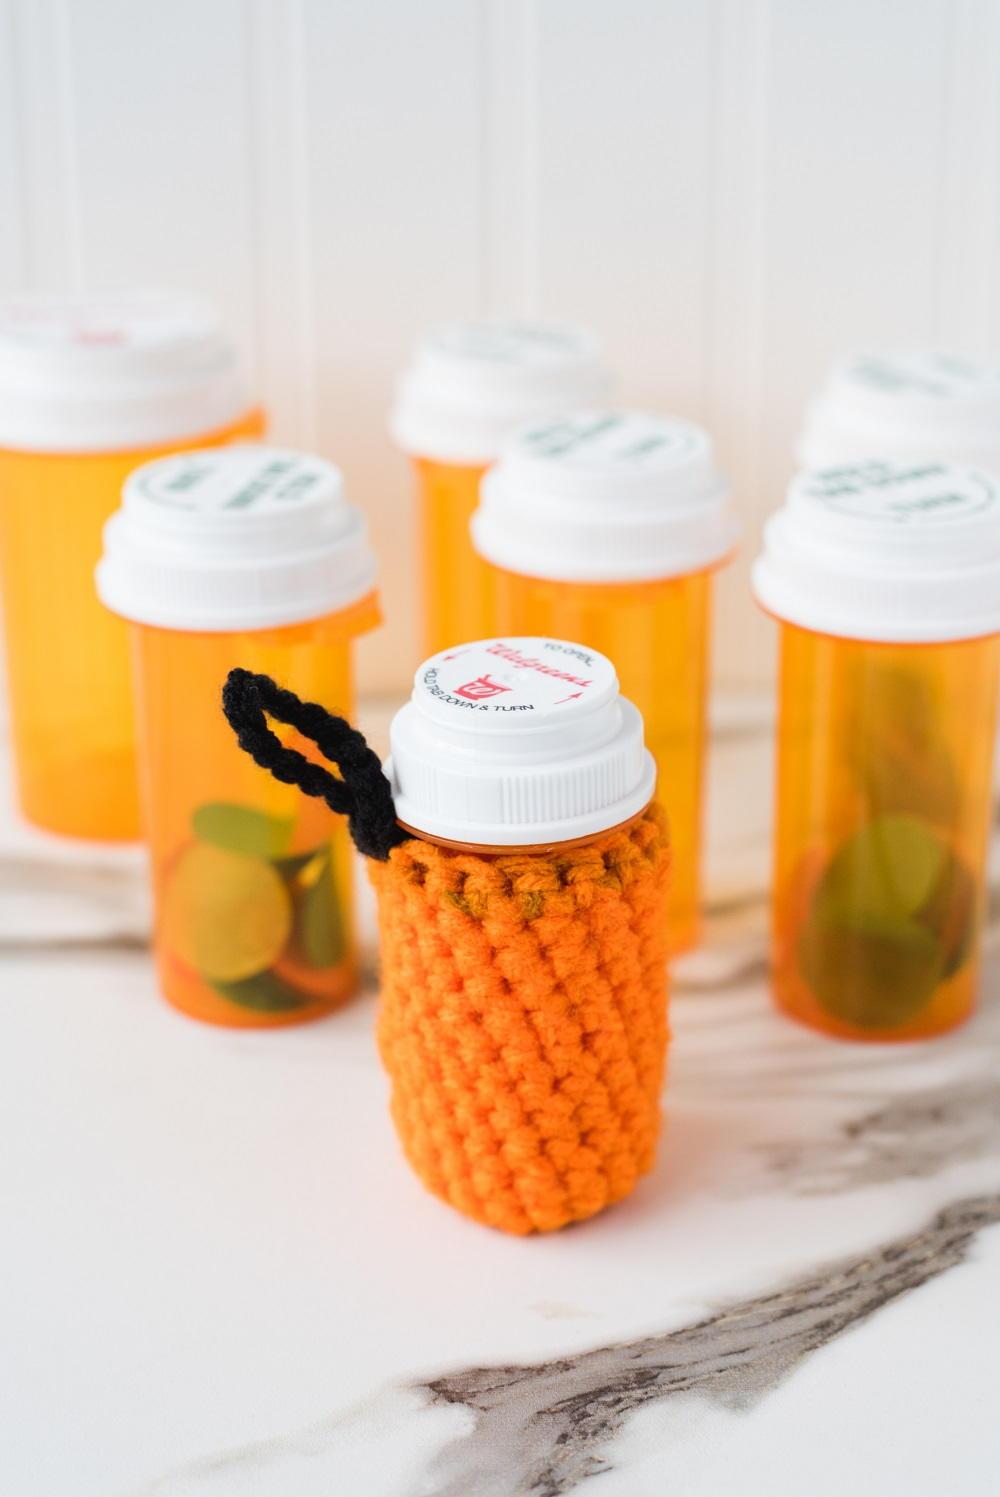 Crochet Pill Bottle Cozy Pattern | FaveCrafts.com